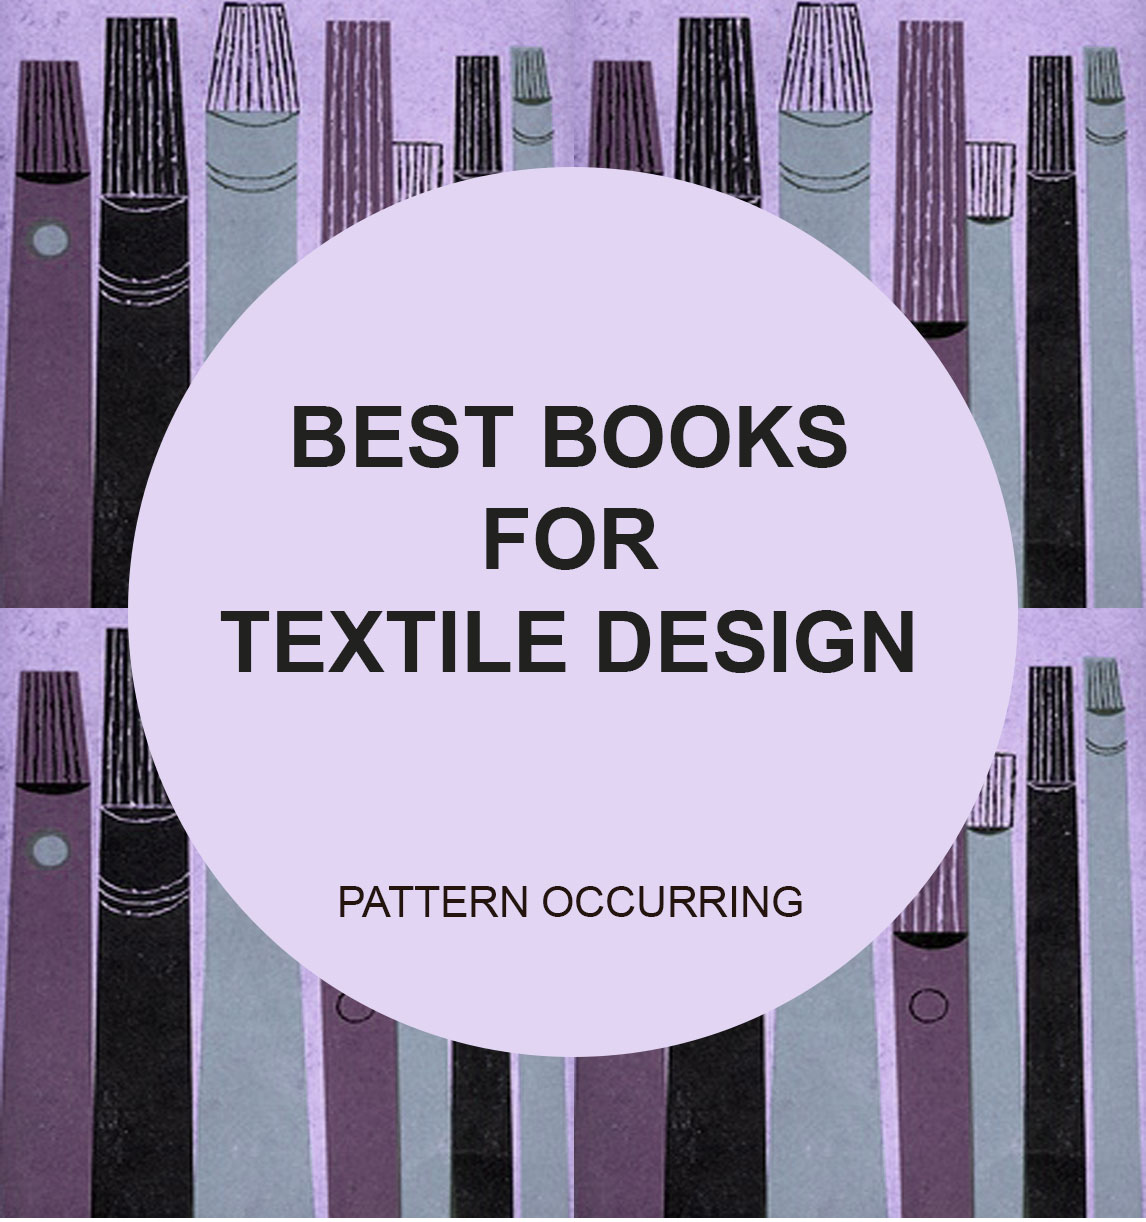 _BEST-BOOKS-TEXTILE-DESIGN.jpg